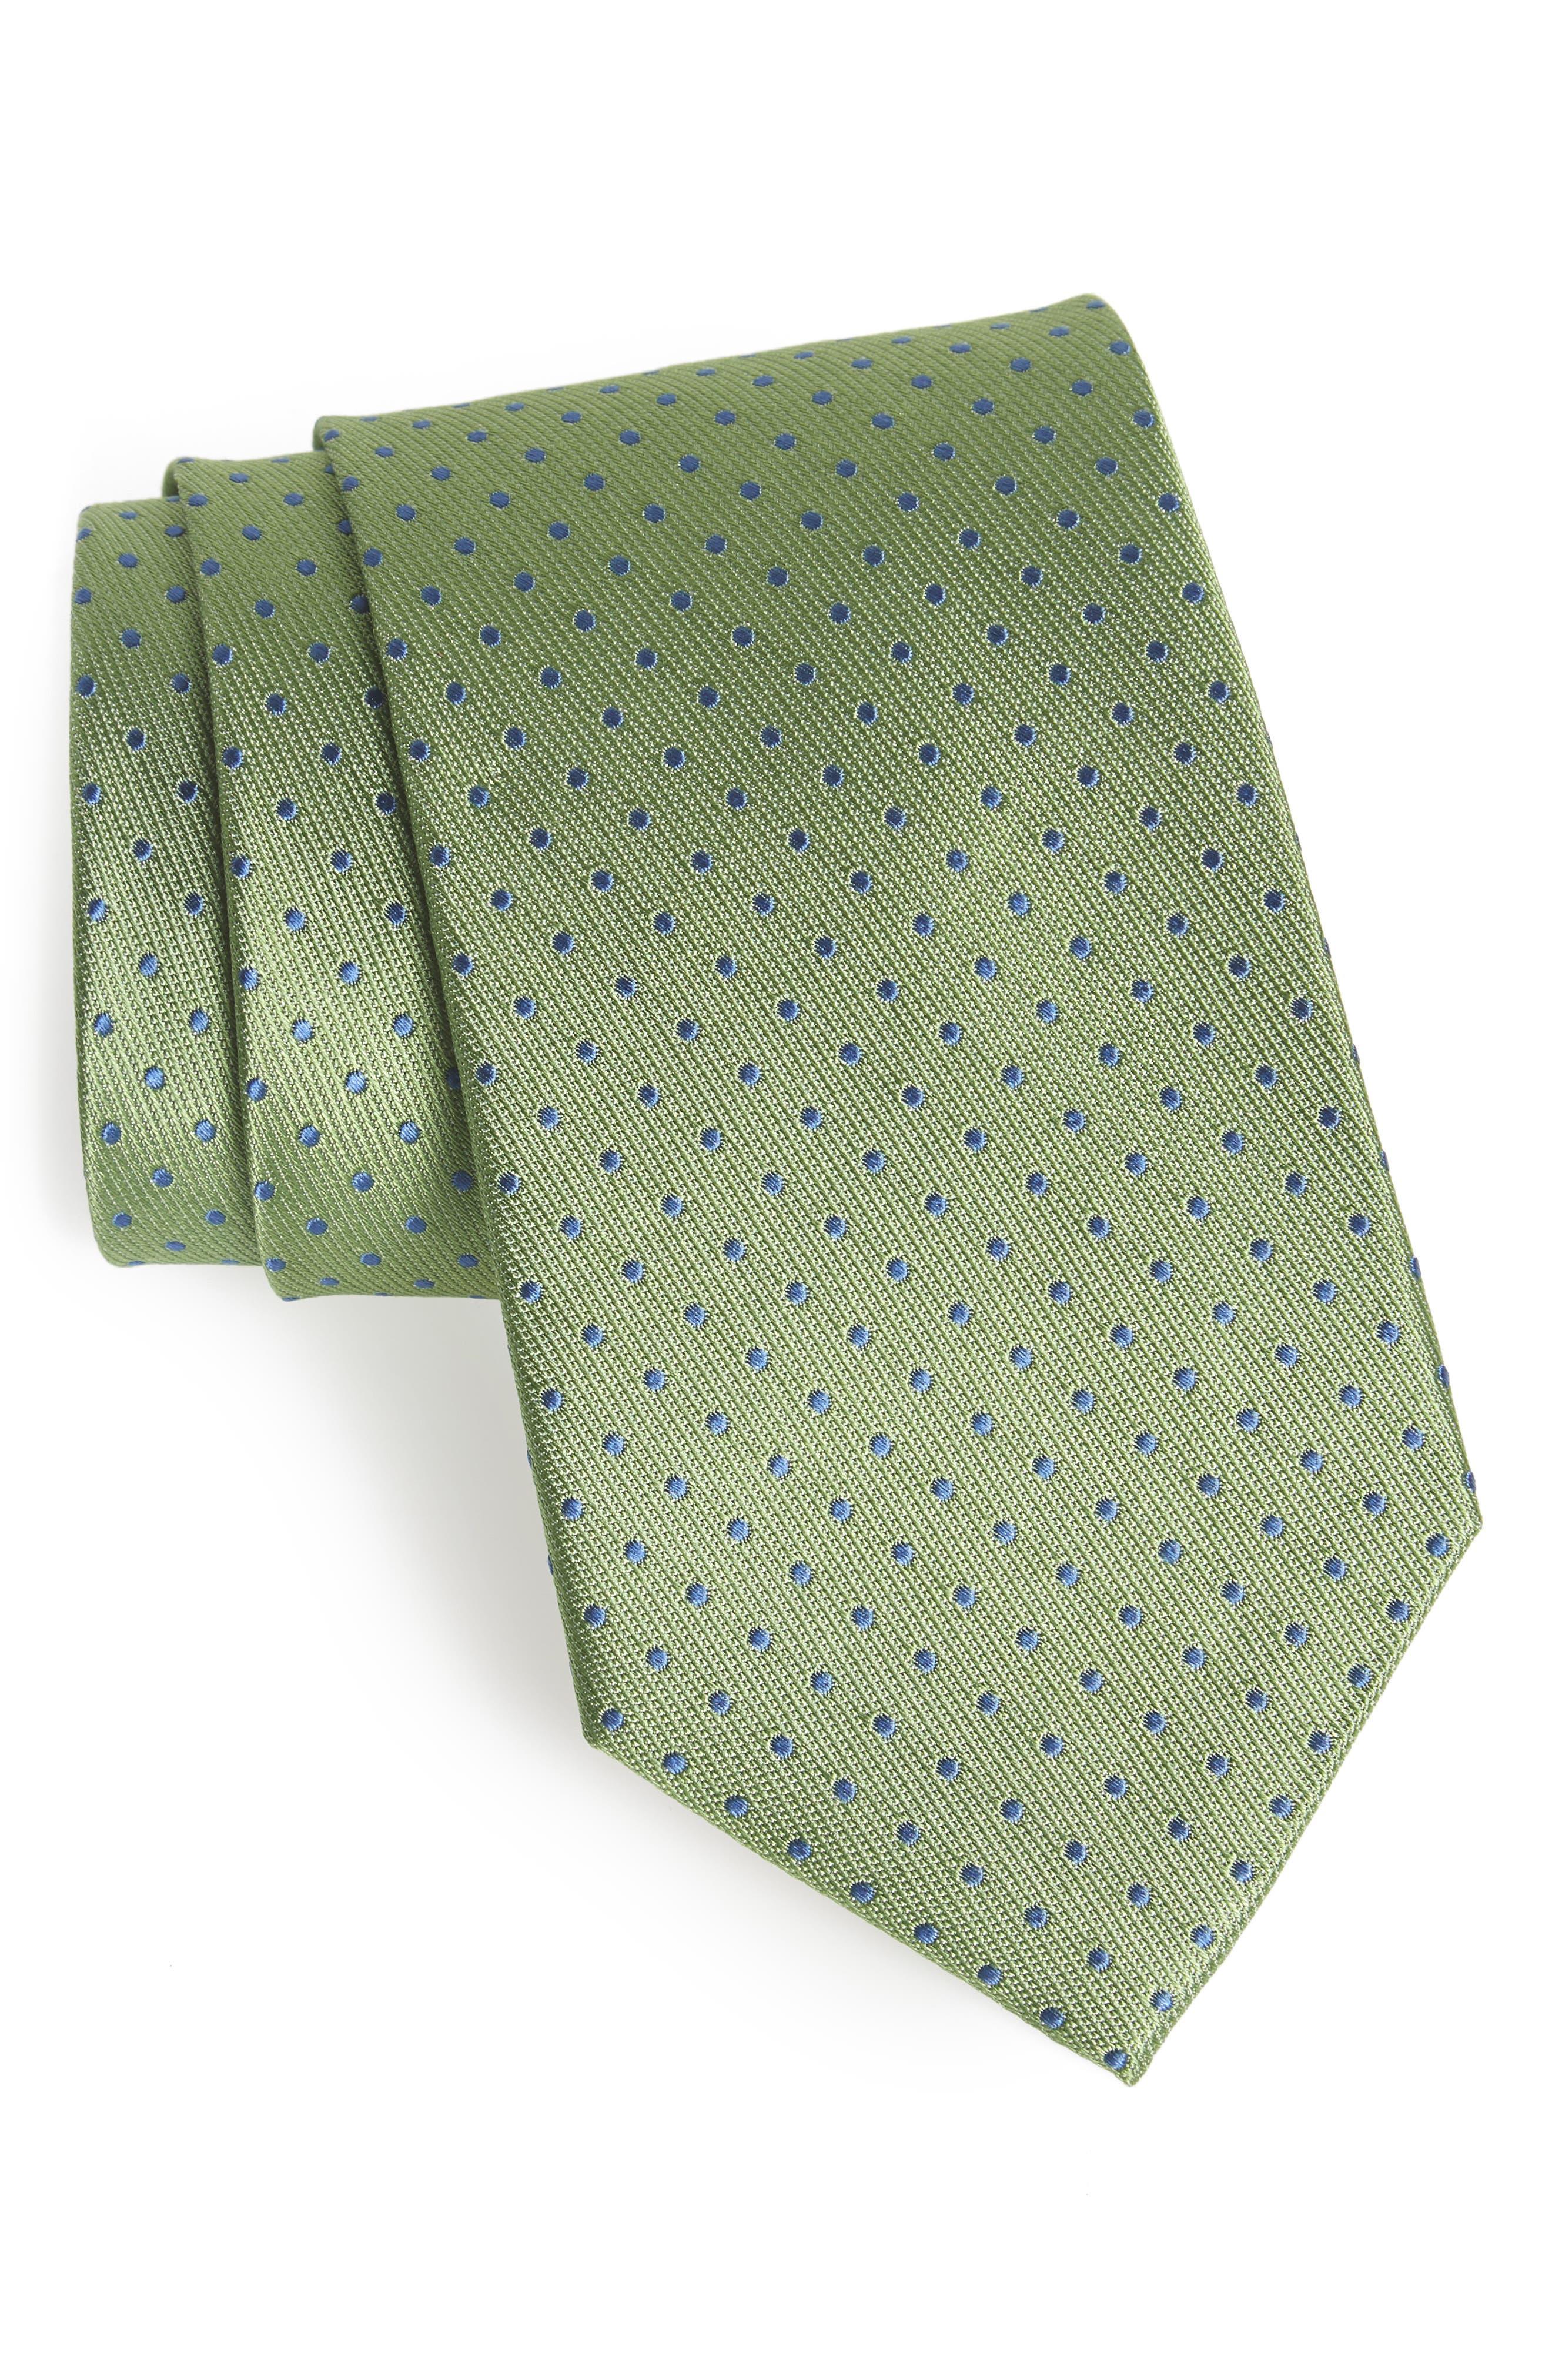 Alternate Image 1 Selected - Nordstrom Men's Shop Sturridge Dot Silk Tie